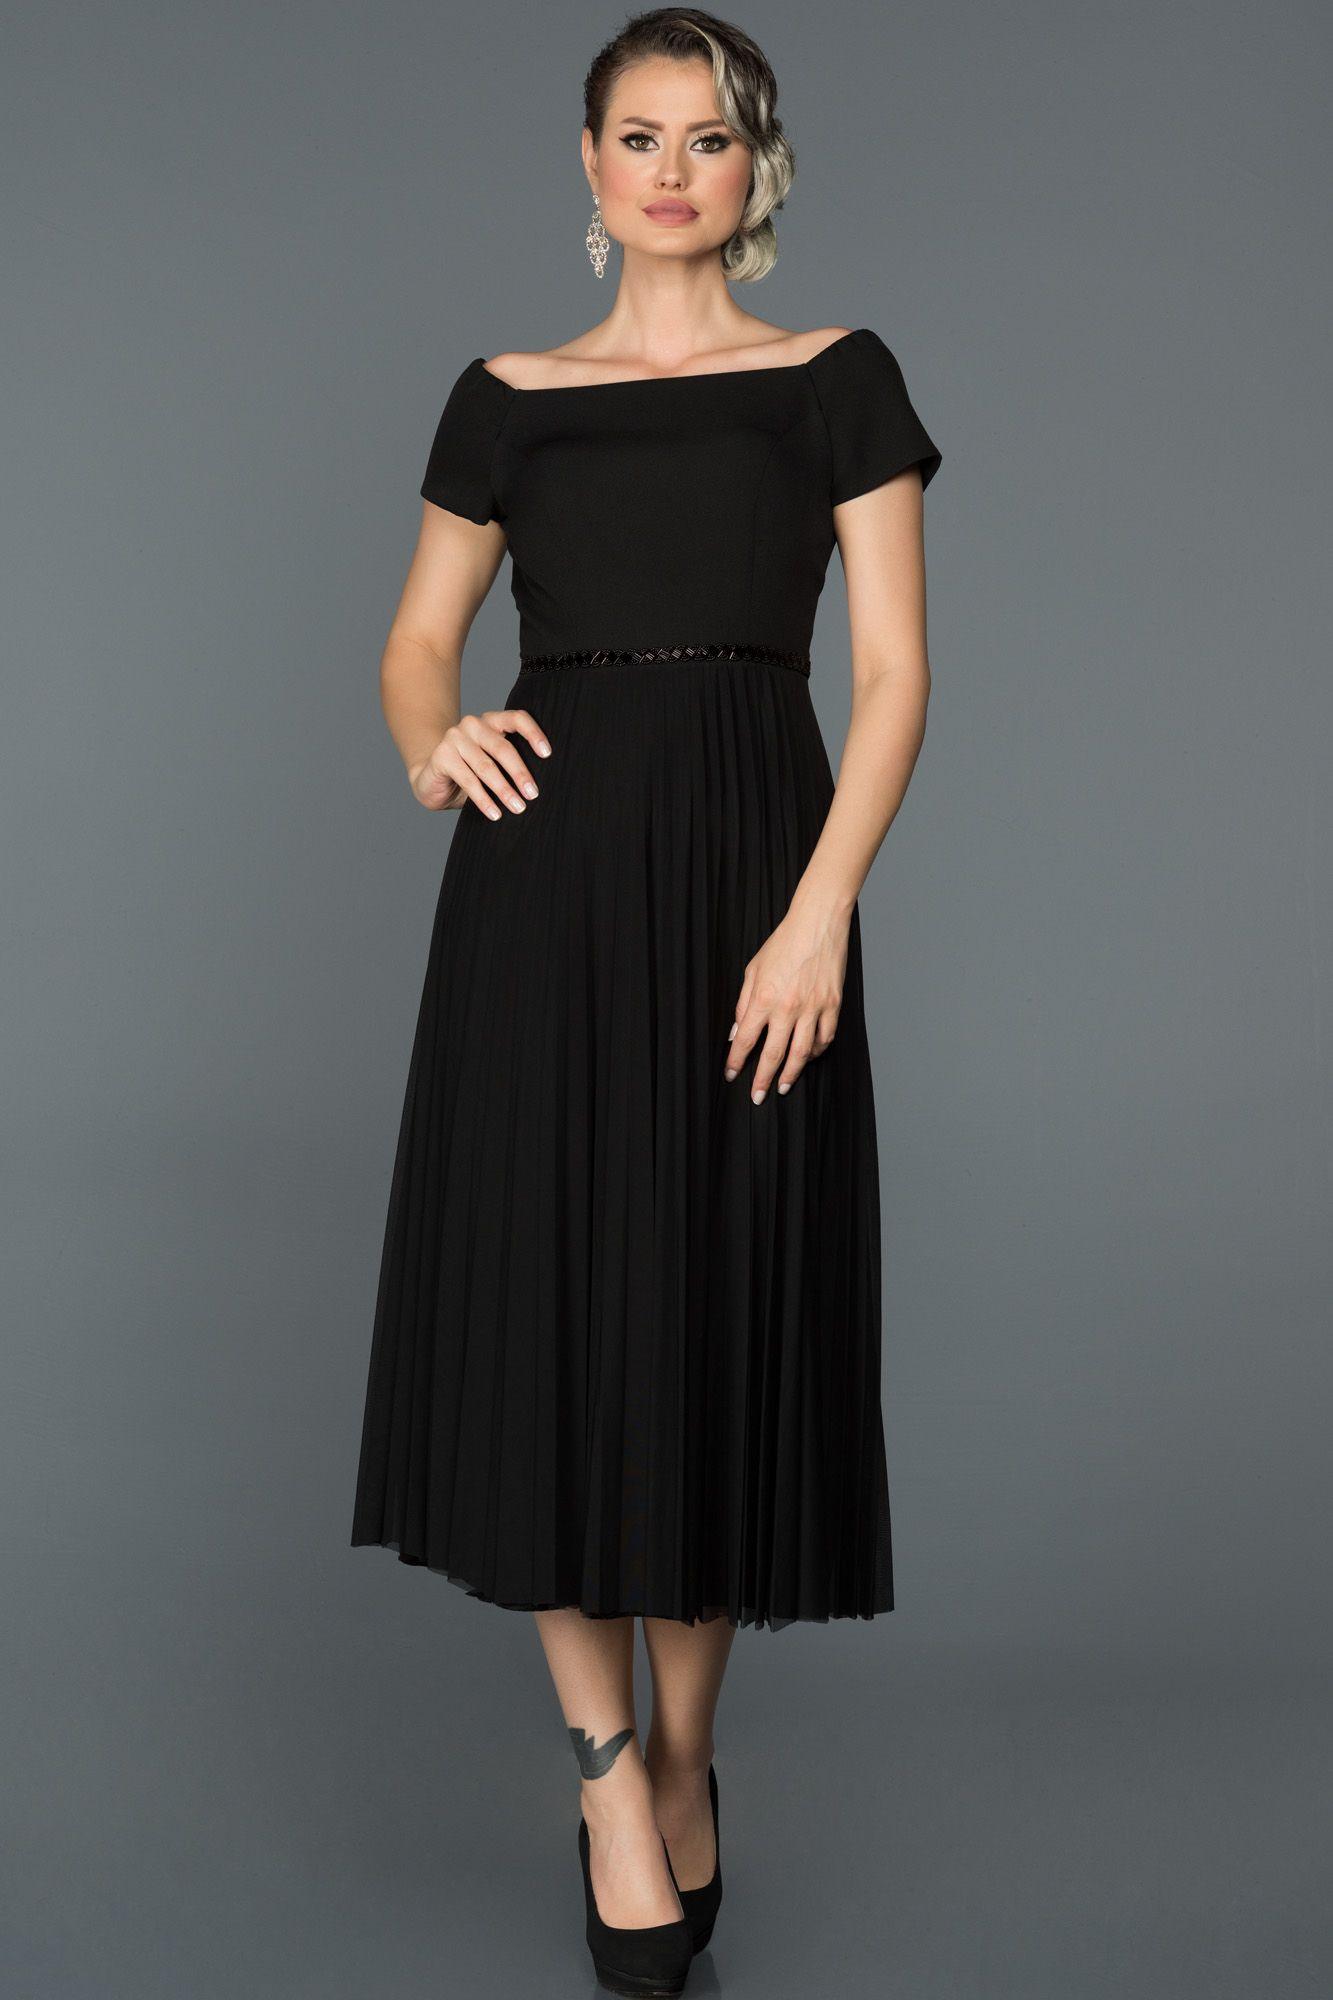 Siyah Midi Boy Sik Elbise Abk086 Elbise Elbise Modelleri The Dress